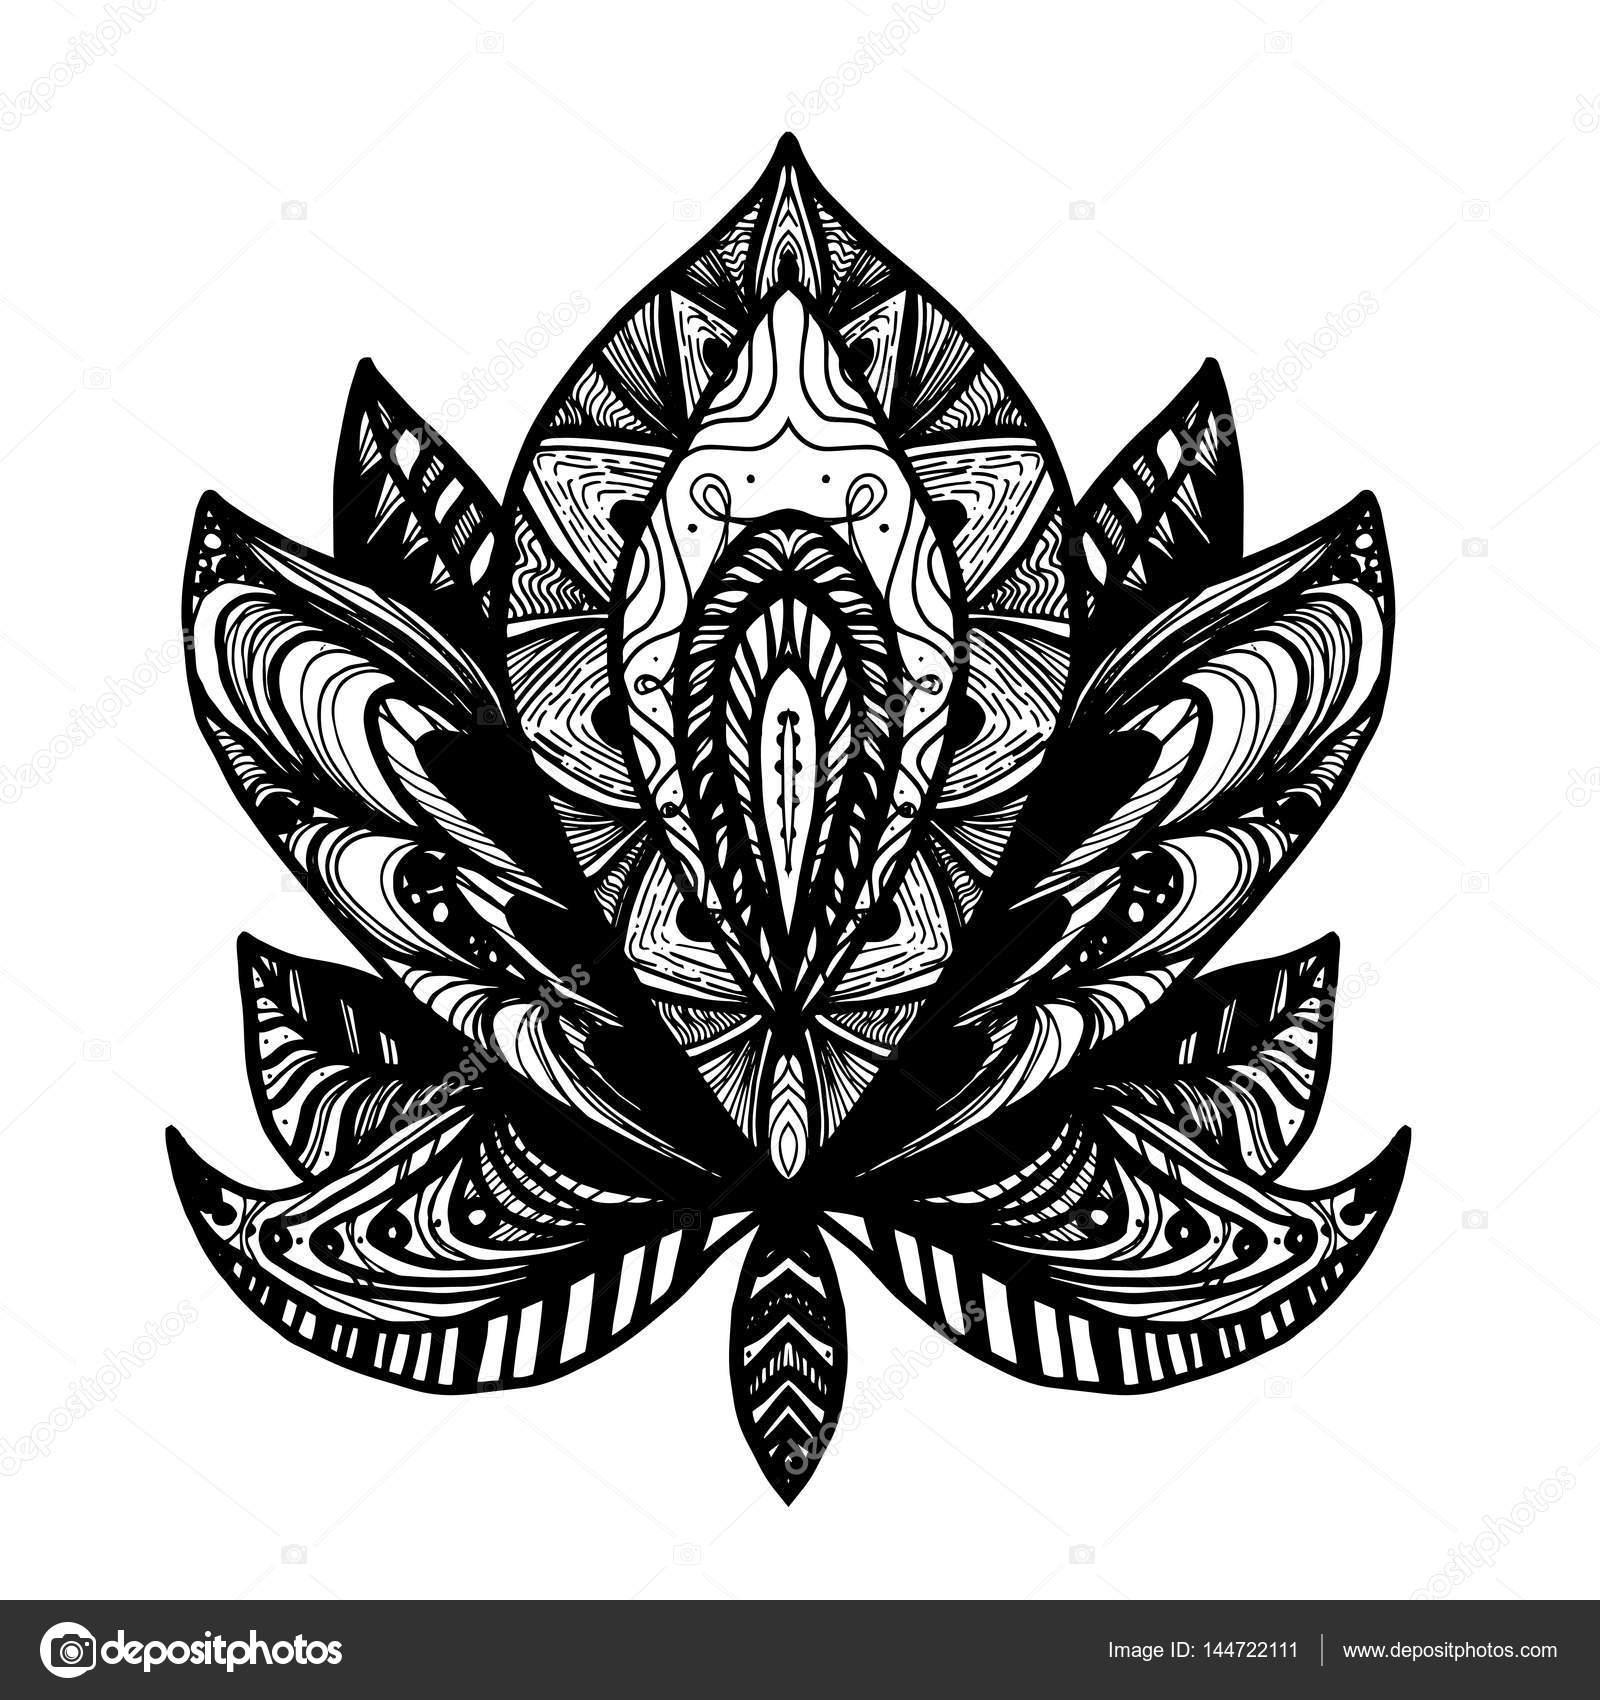 Flower lotus tattoo stock vector barsrsind 144722111 flower lotus magic symbol for print tattoo coloring bookfabric t shirt cloth in boho style tribal lotus design vector vector by barsrsind izmirmasajfo